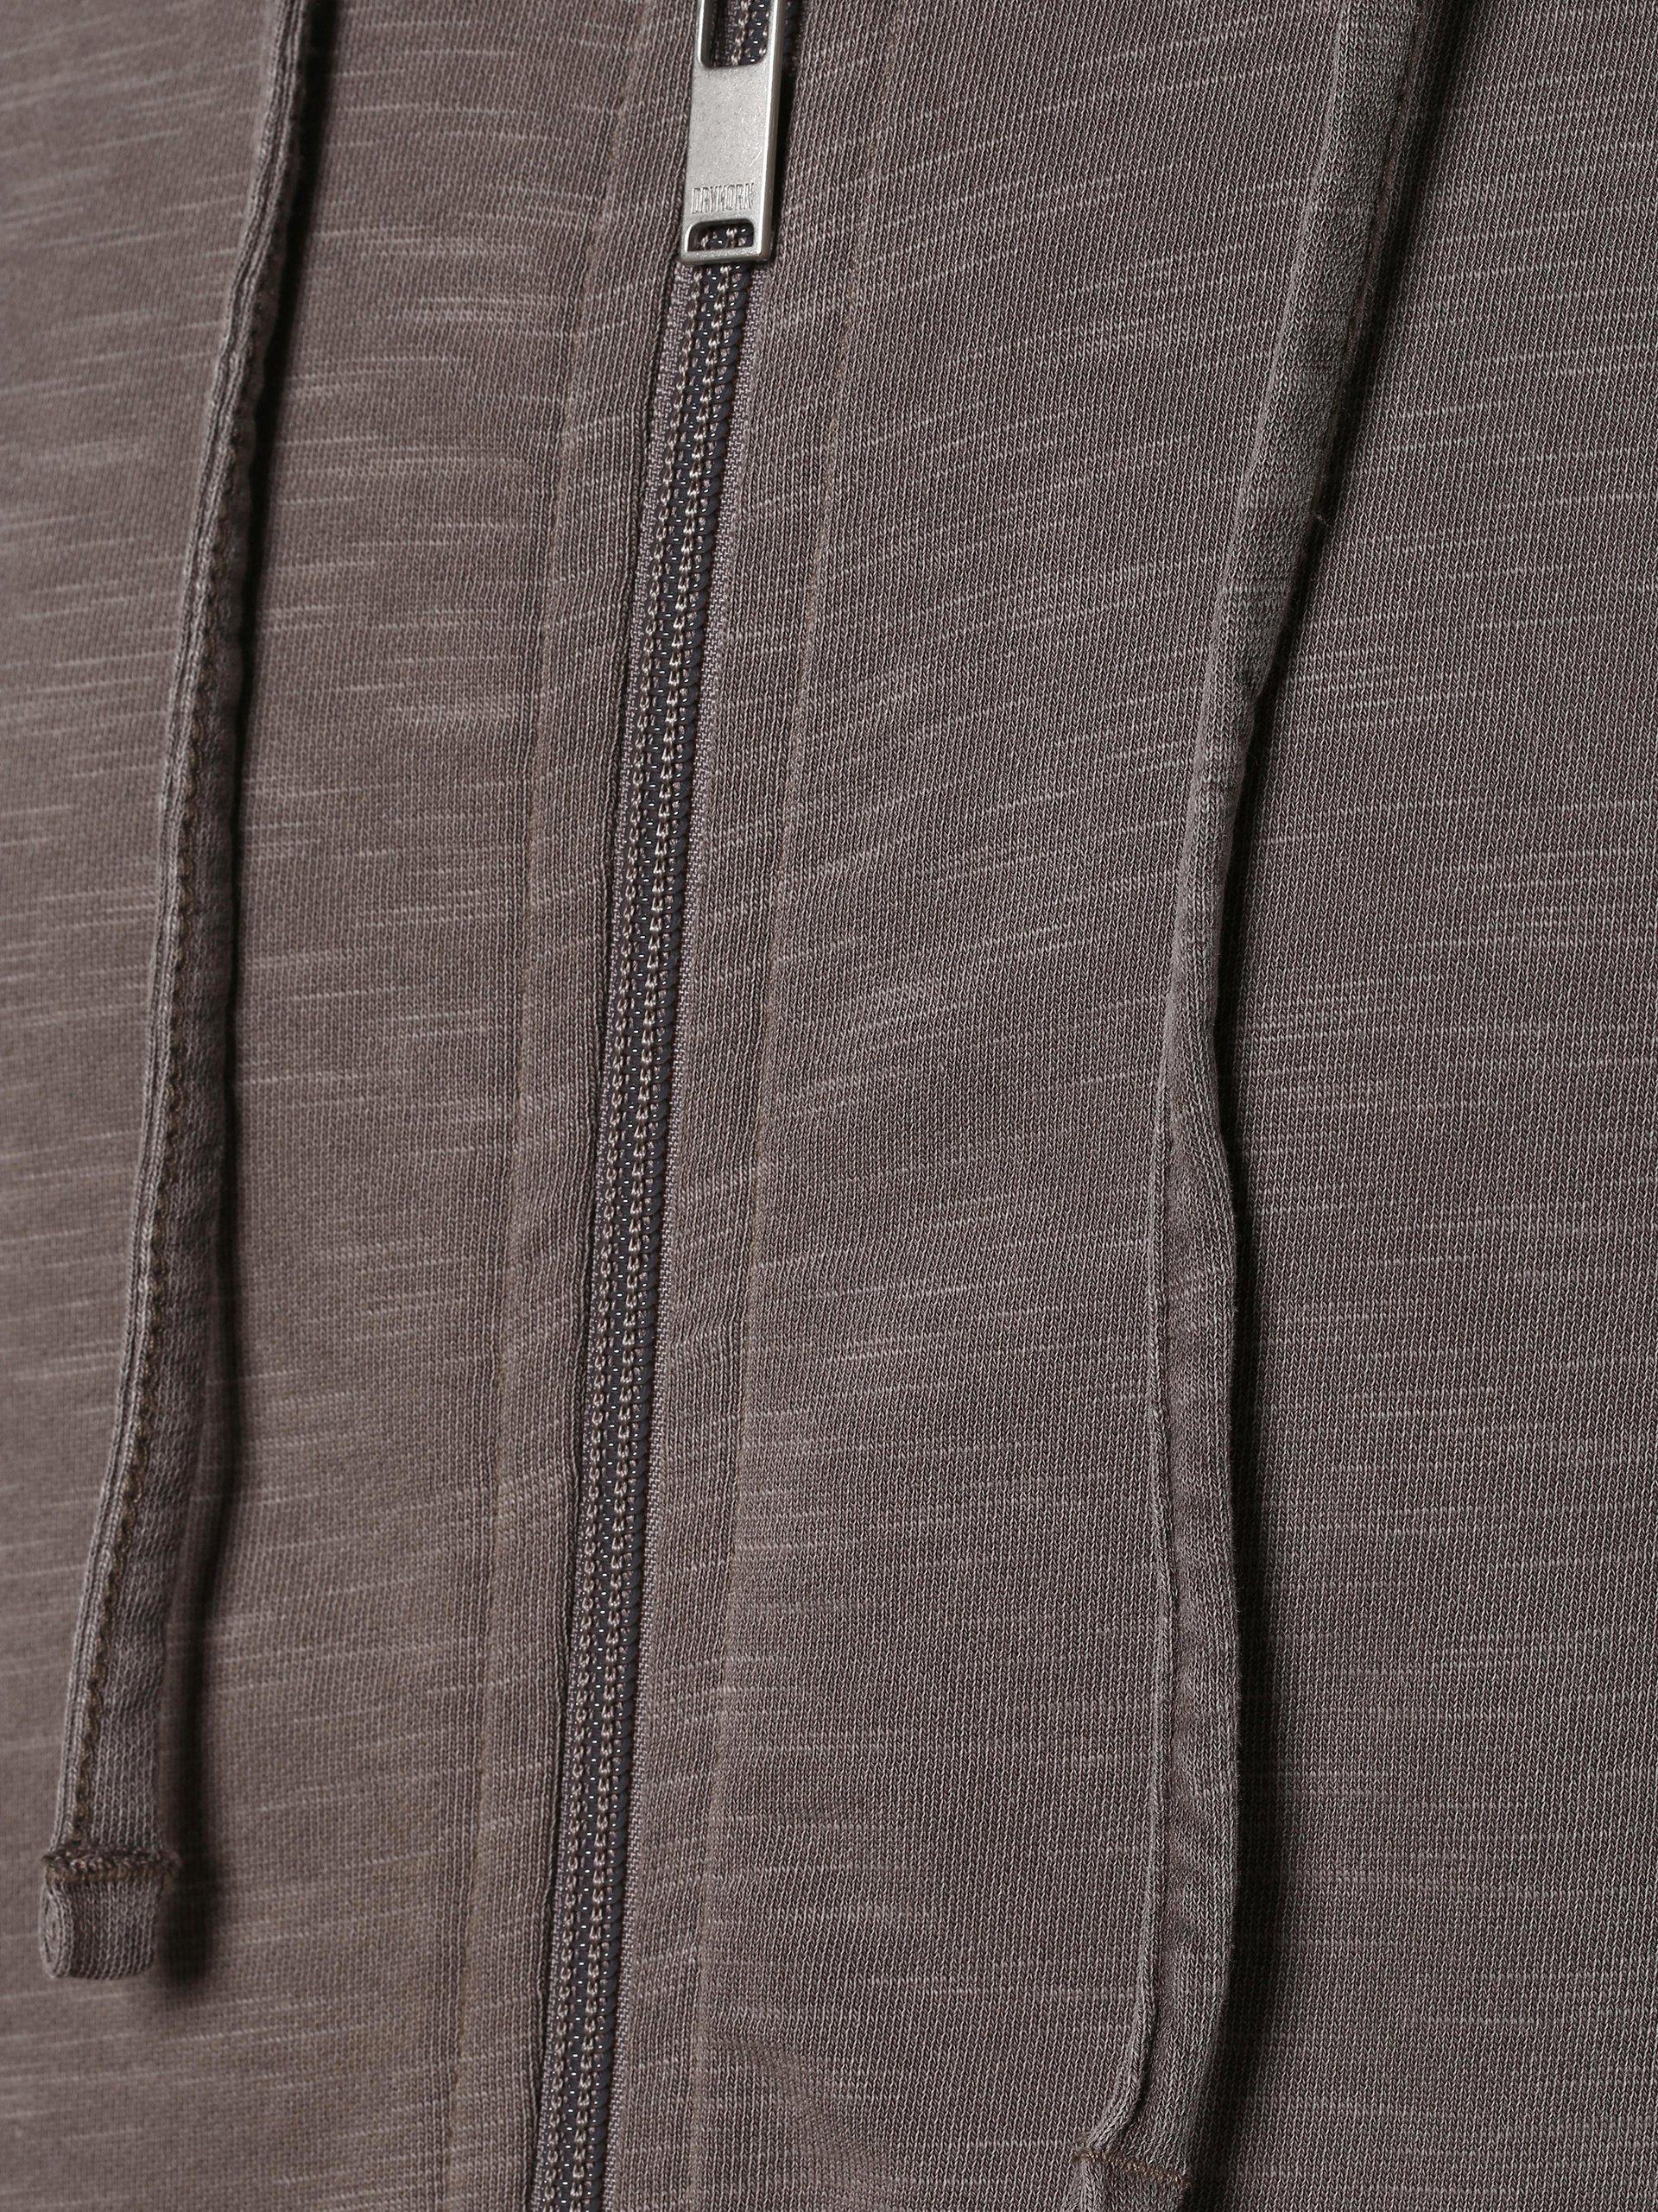 Drykorn Męska bluza rozpinana – Payn